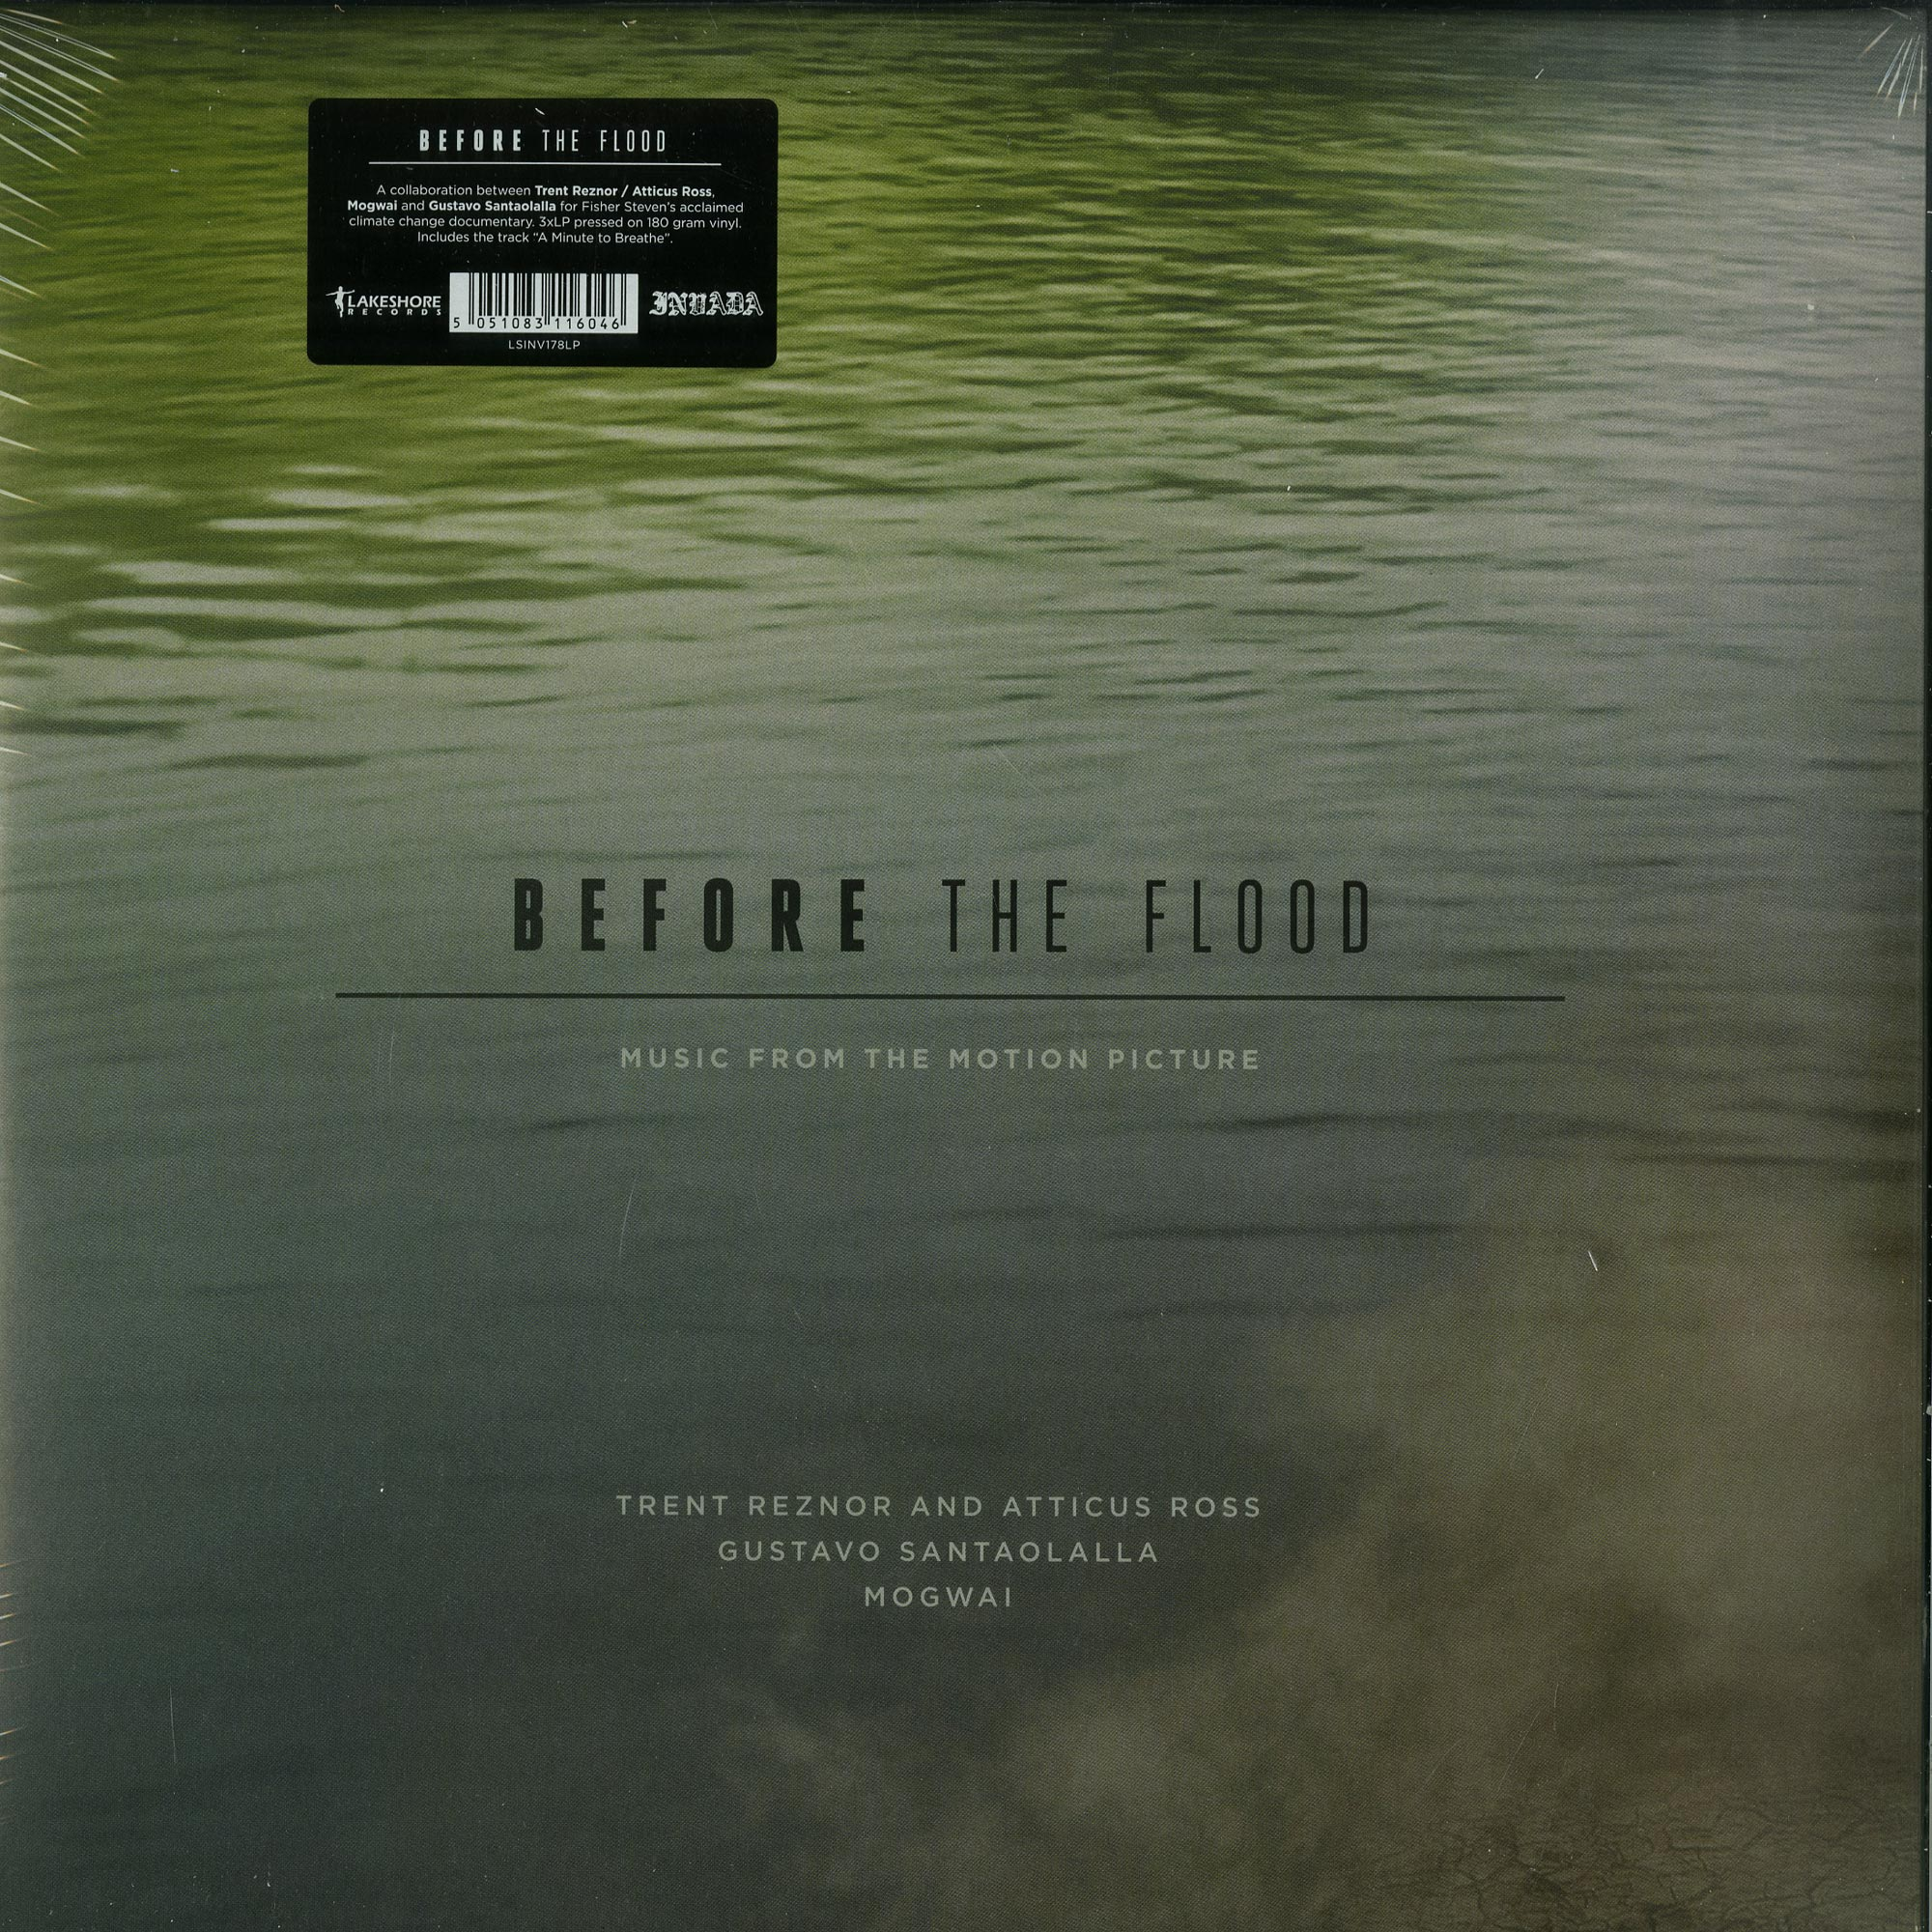 Trent Reznor & Atticus Ross, Gustavo Santaolalla, Mogwai - BEFORE THE FLOOD O.S.T.